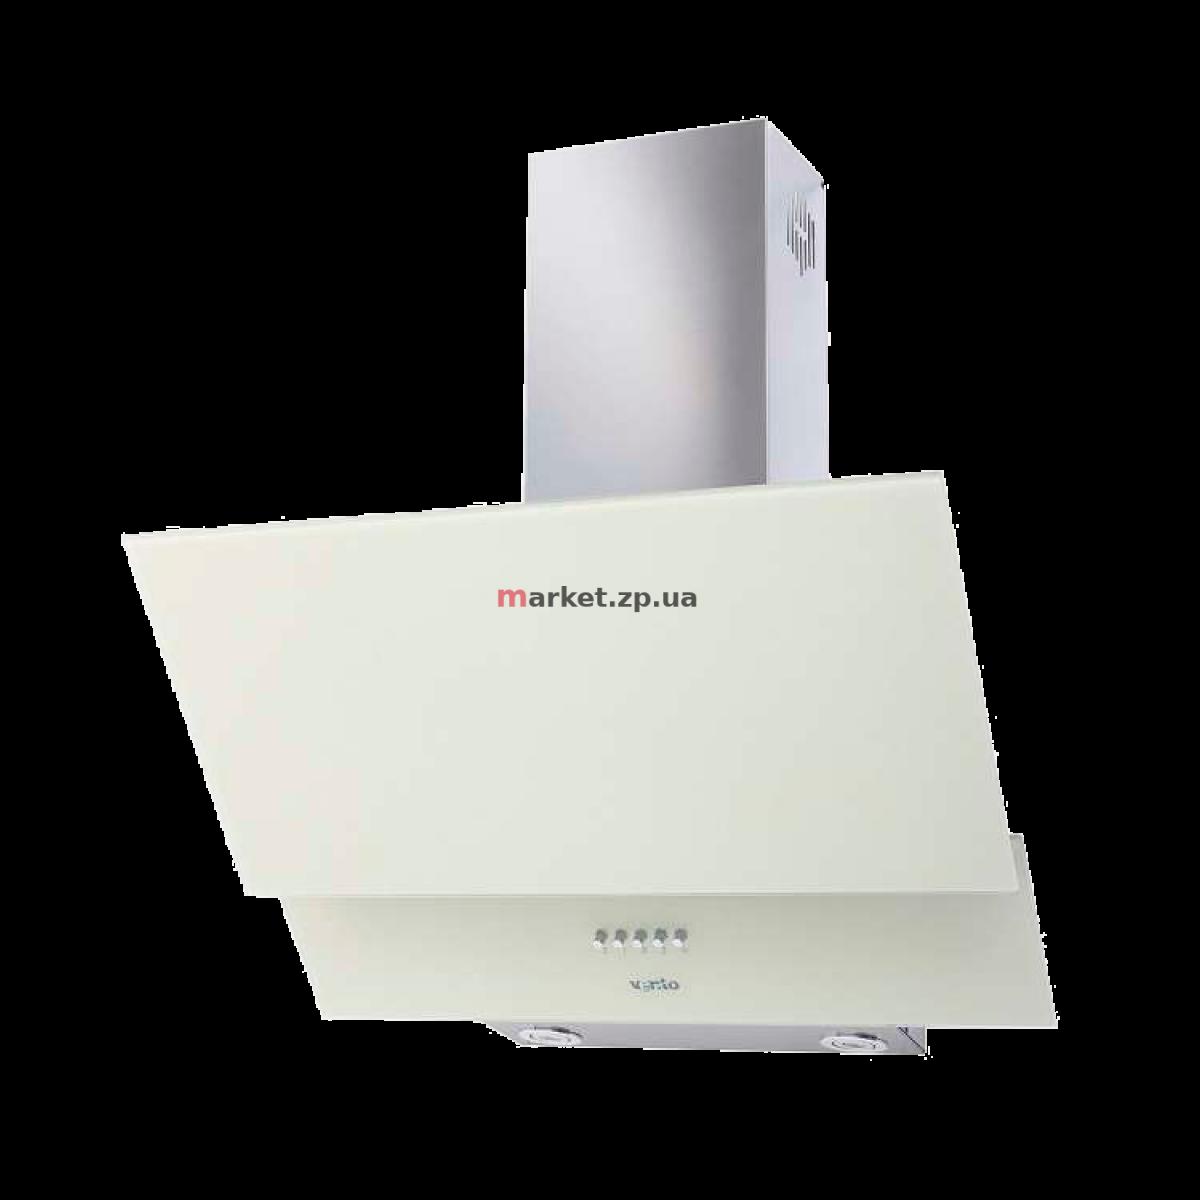 Вытяжка VENTOLUX ROMANIA 60 SAND 3G (750) PB